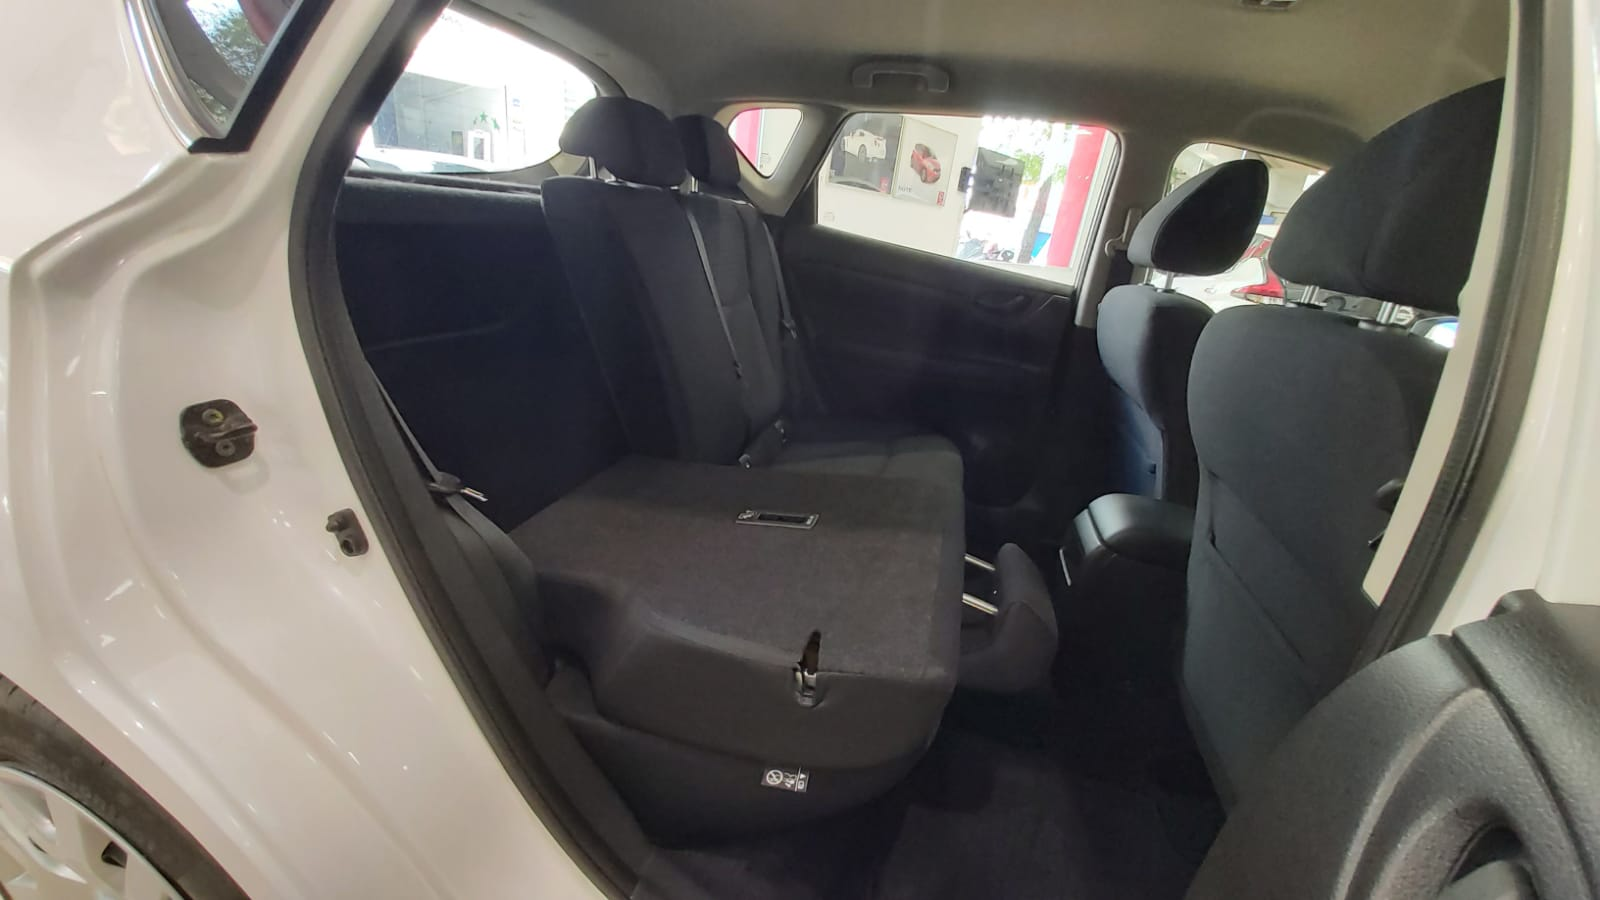 Nissan Pulsar 1.5 Visia dCI, 81kW/110 PS full